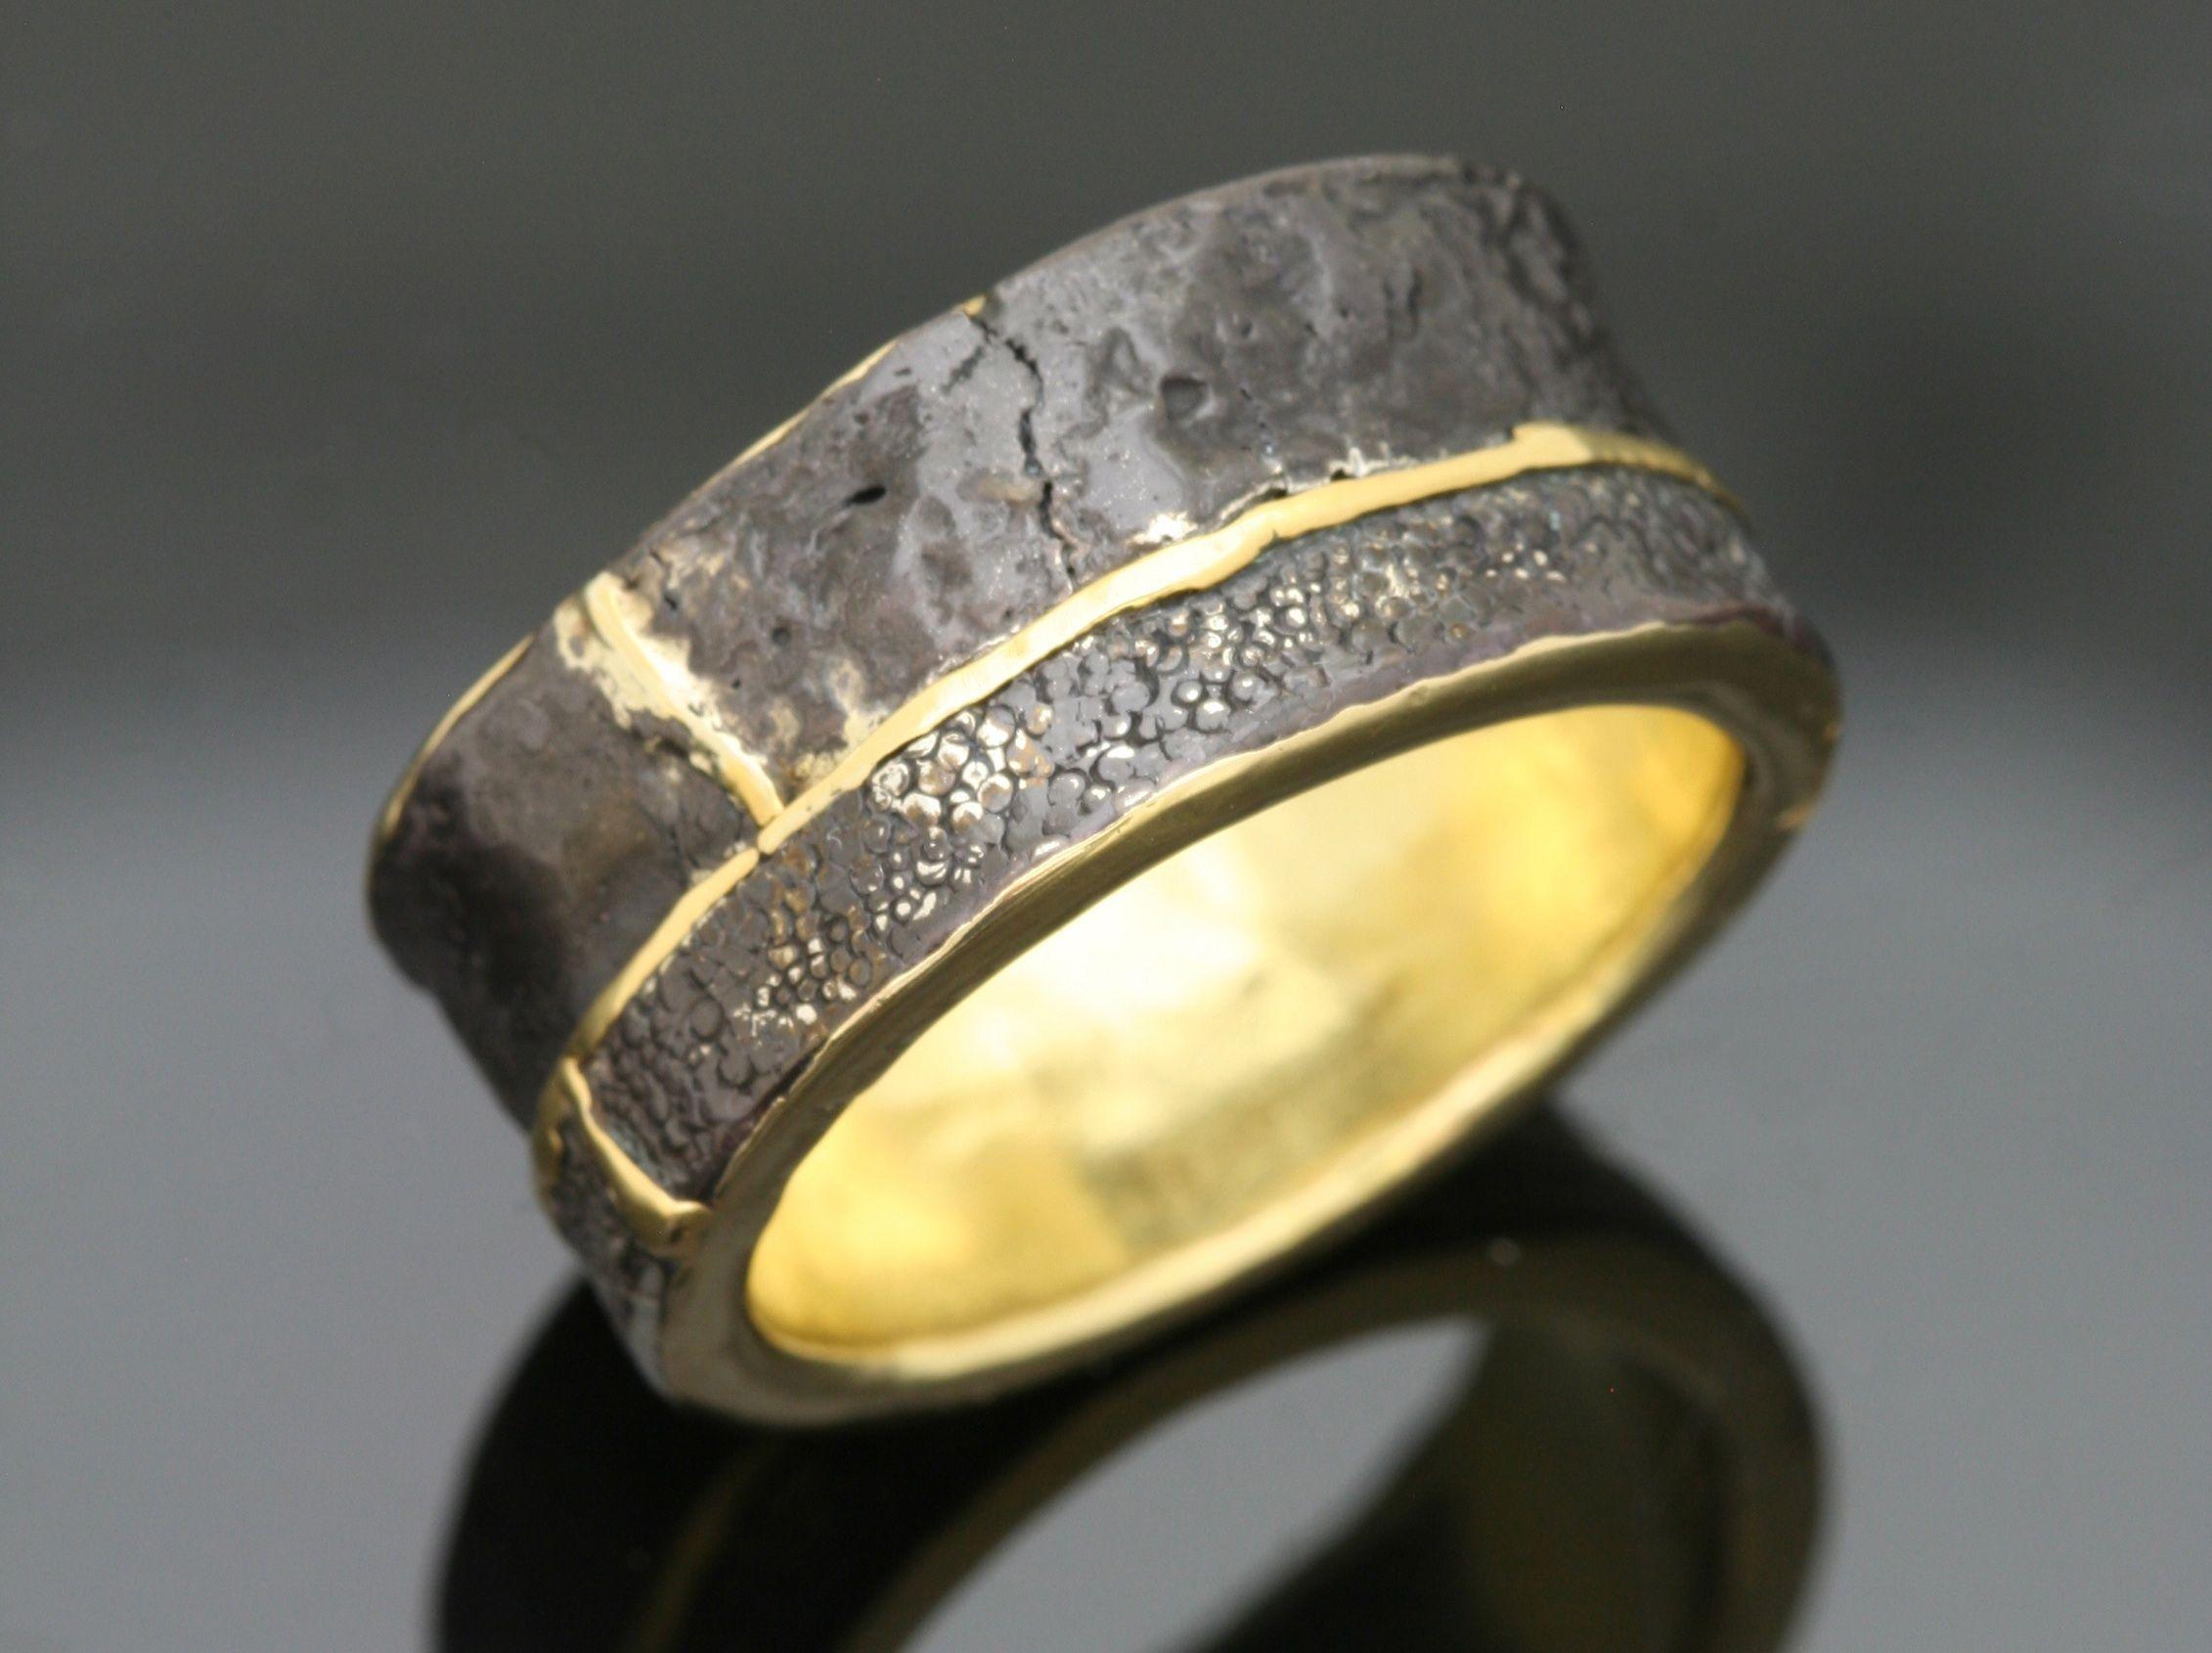 Anne bulmer brewer studio his wedding ring 1 marriage